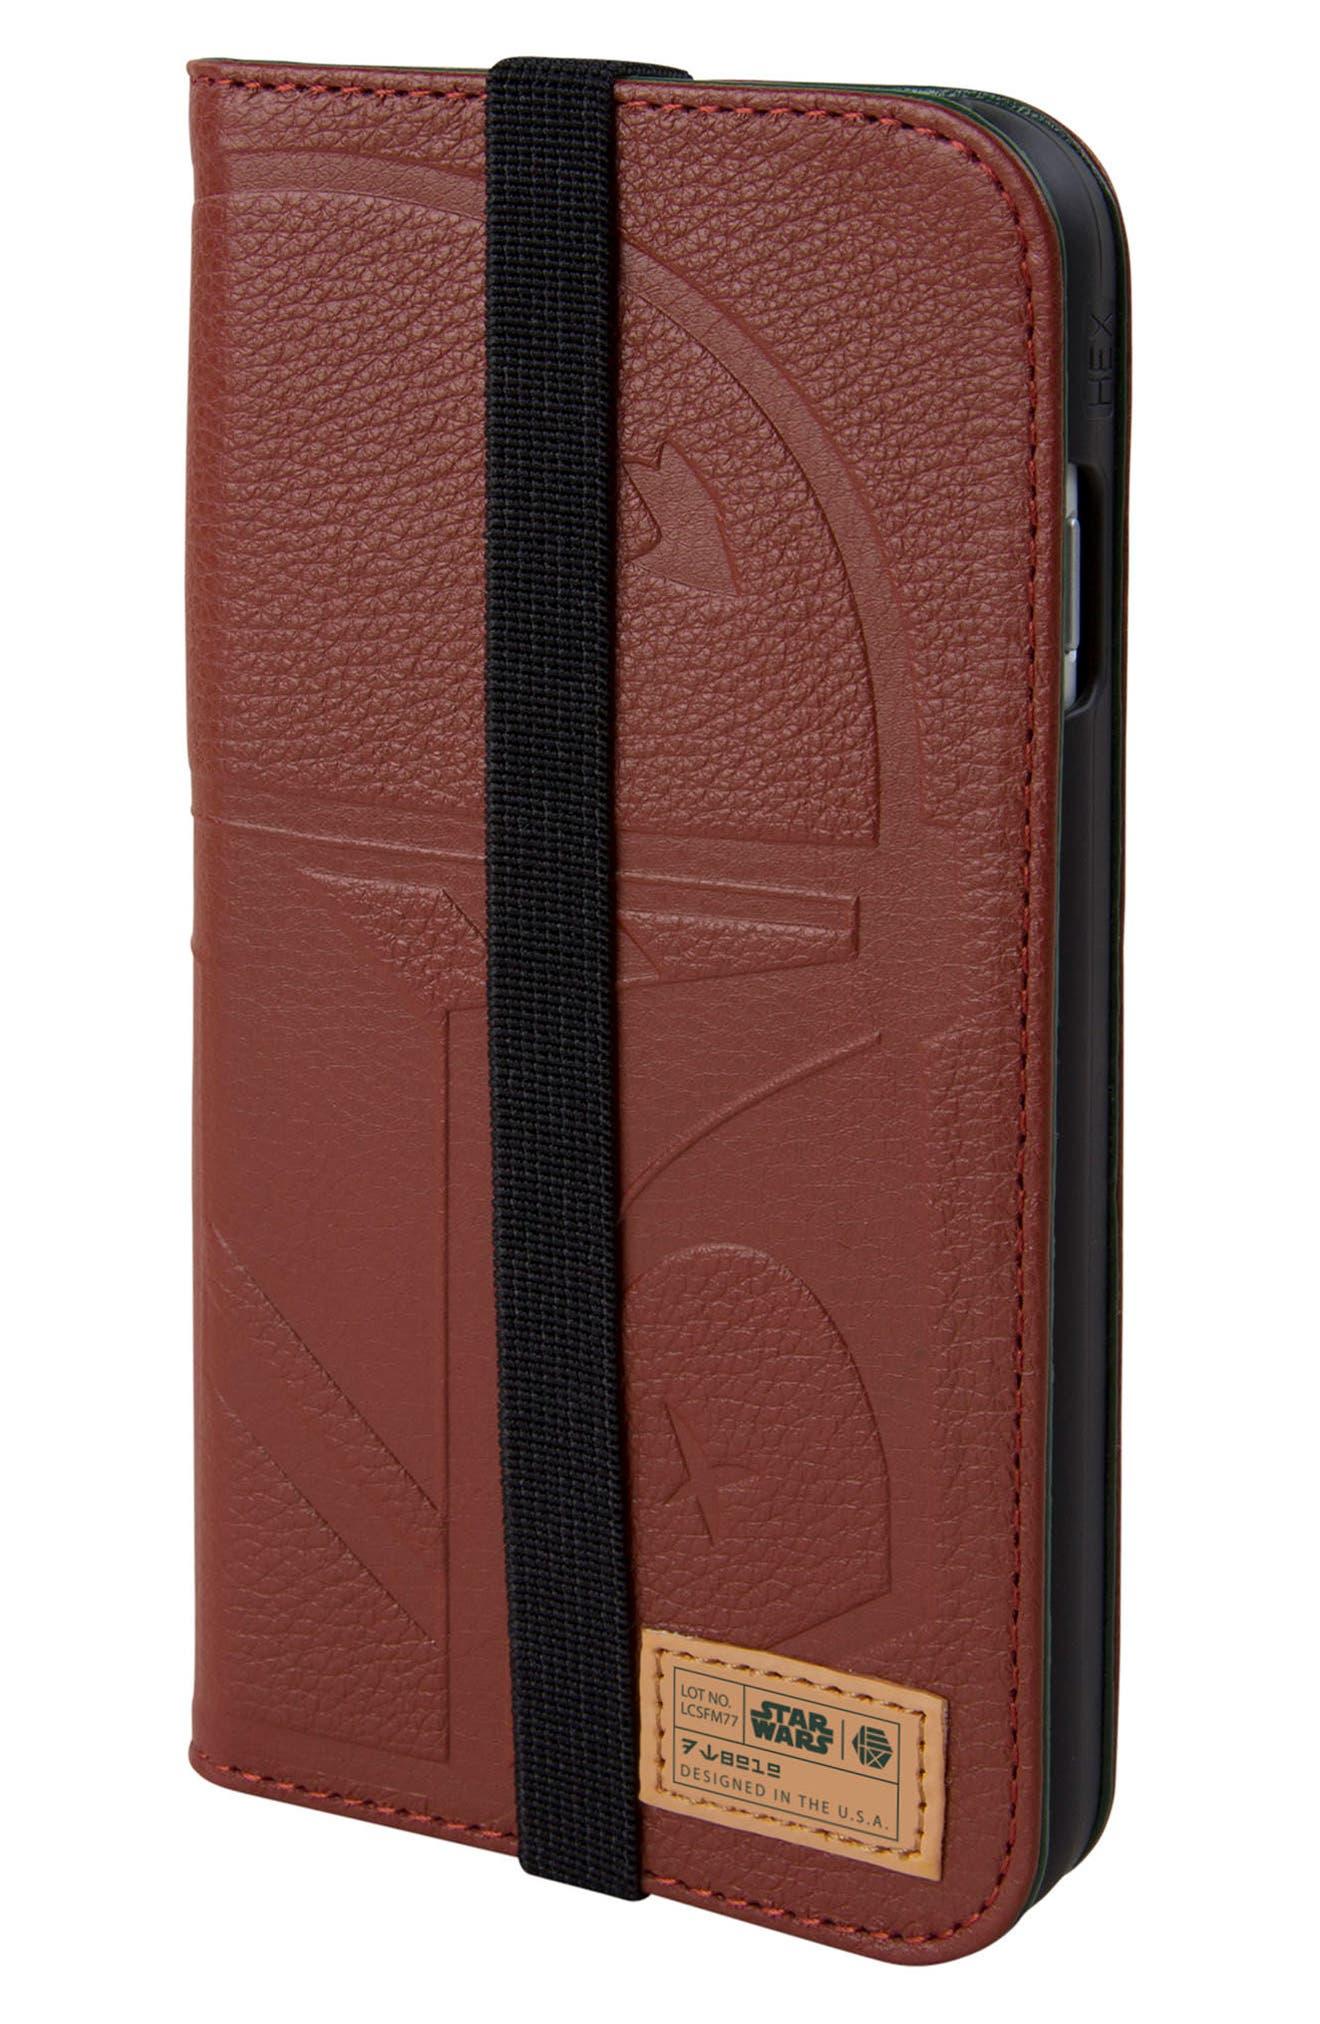 HEX R2-D2 iPhone 6/6s/7/8 Wallet Case